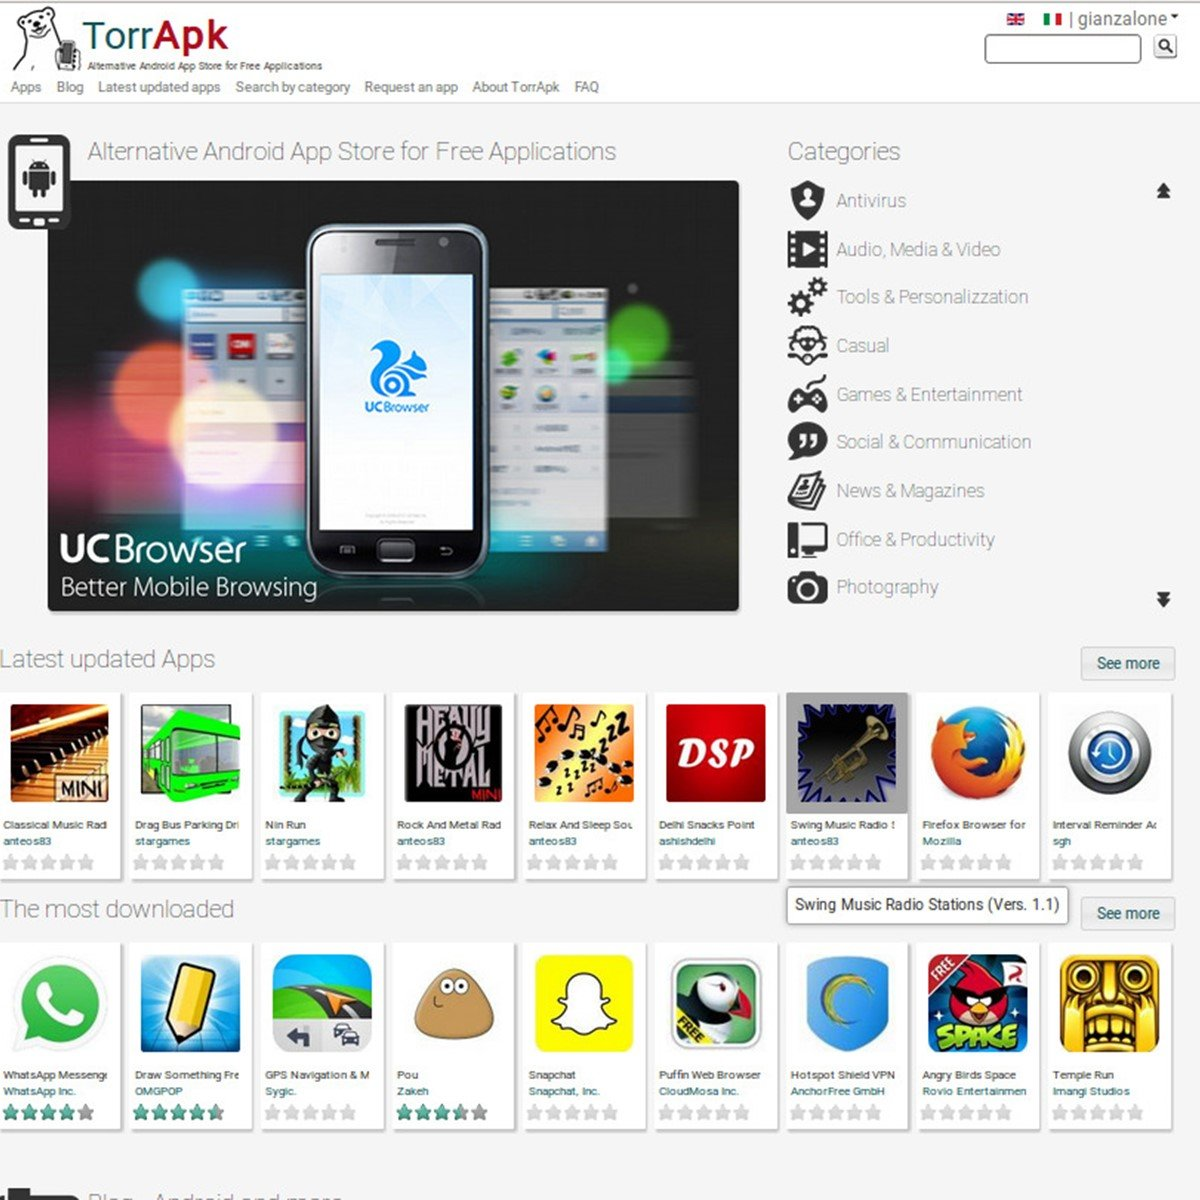 TorrApk Alternatives and Similar Websites and Apps